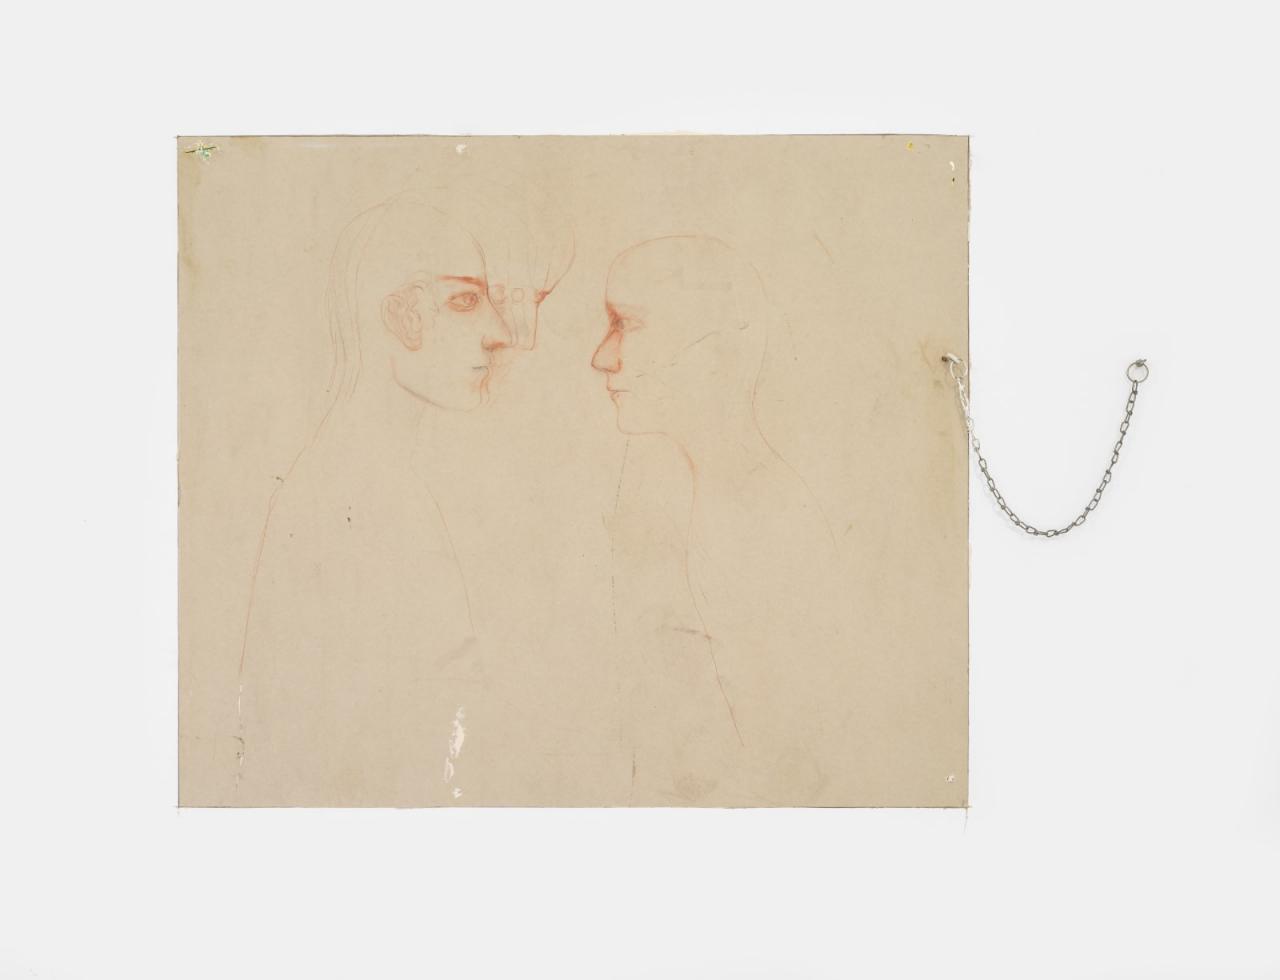 Tolia Astakhishvli and James Richards, Tenant (Dream Catcher ) , 2021